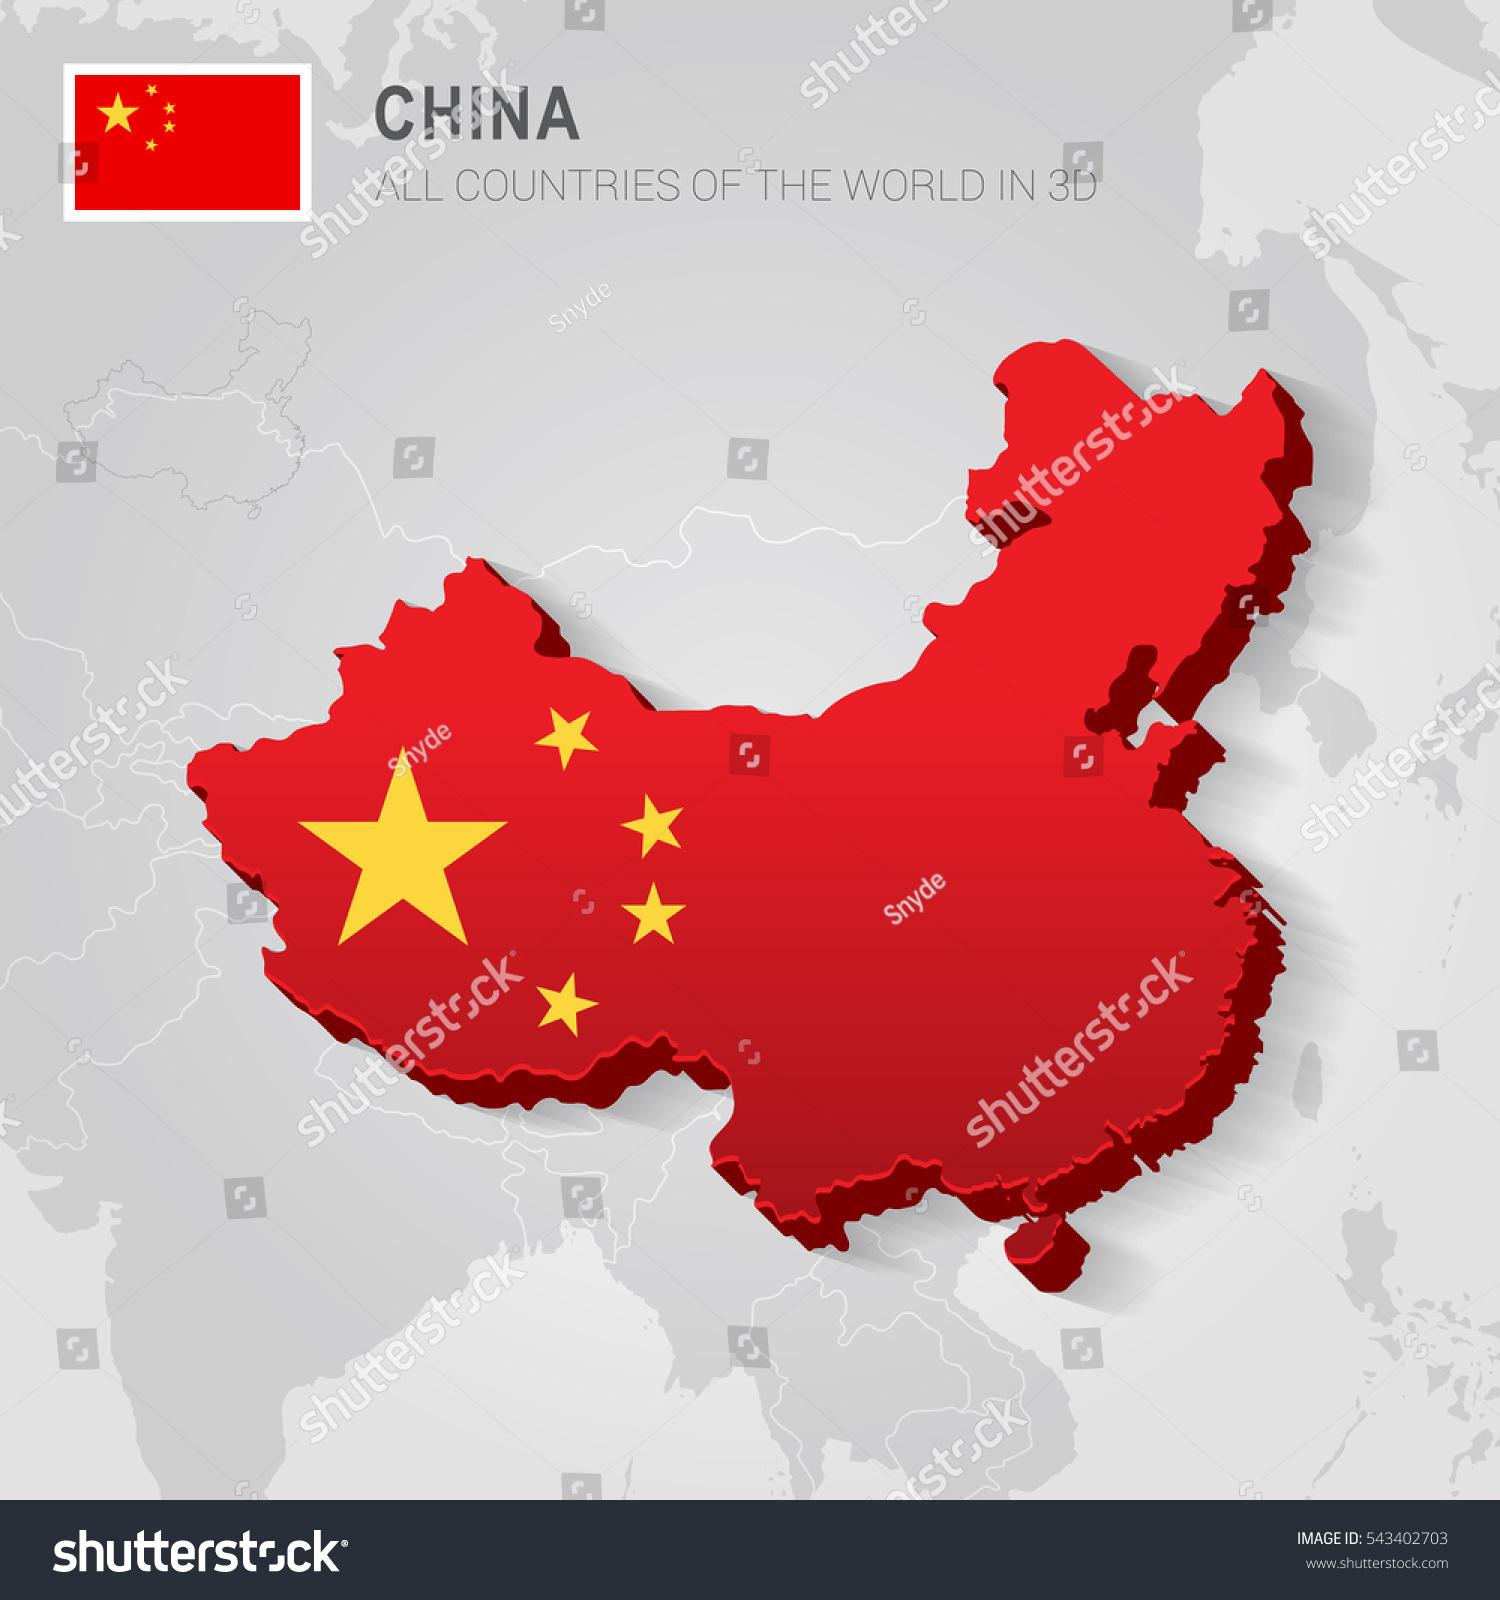 China Neighboring Countries Asia Administrative Map Stock Vector - Map argentina neighboring countries